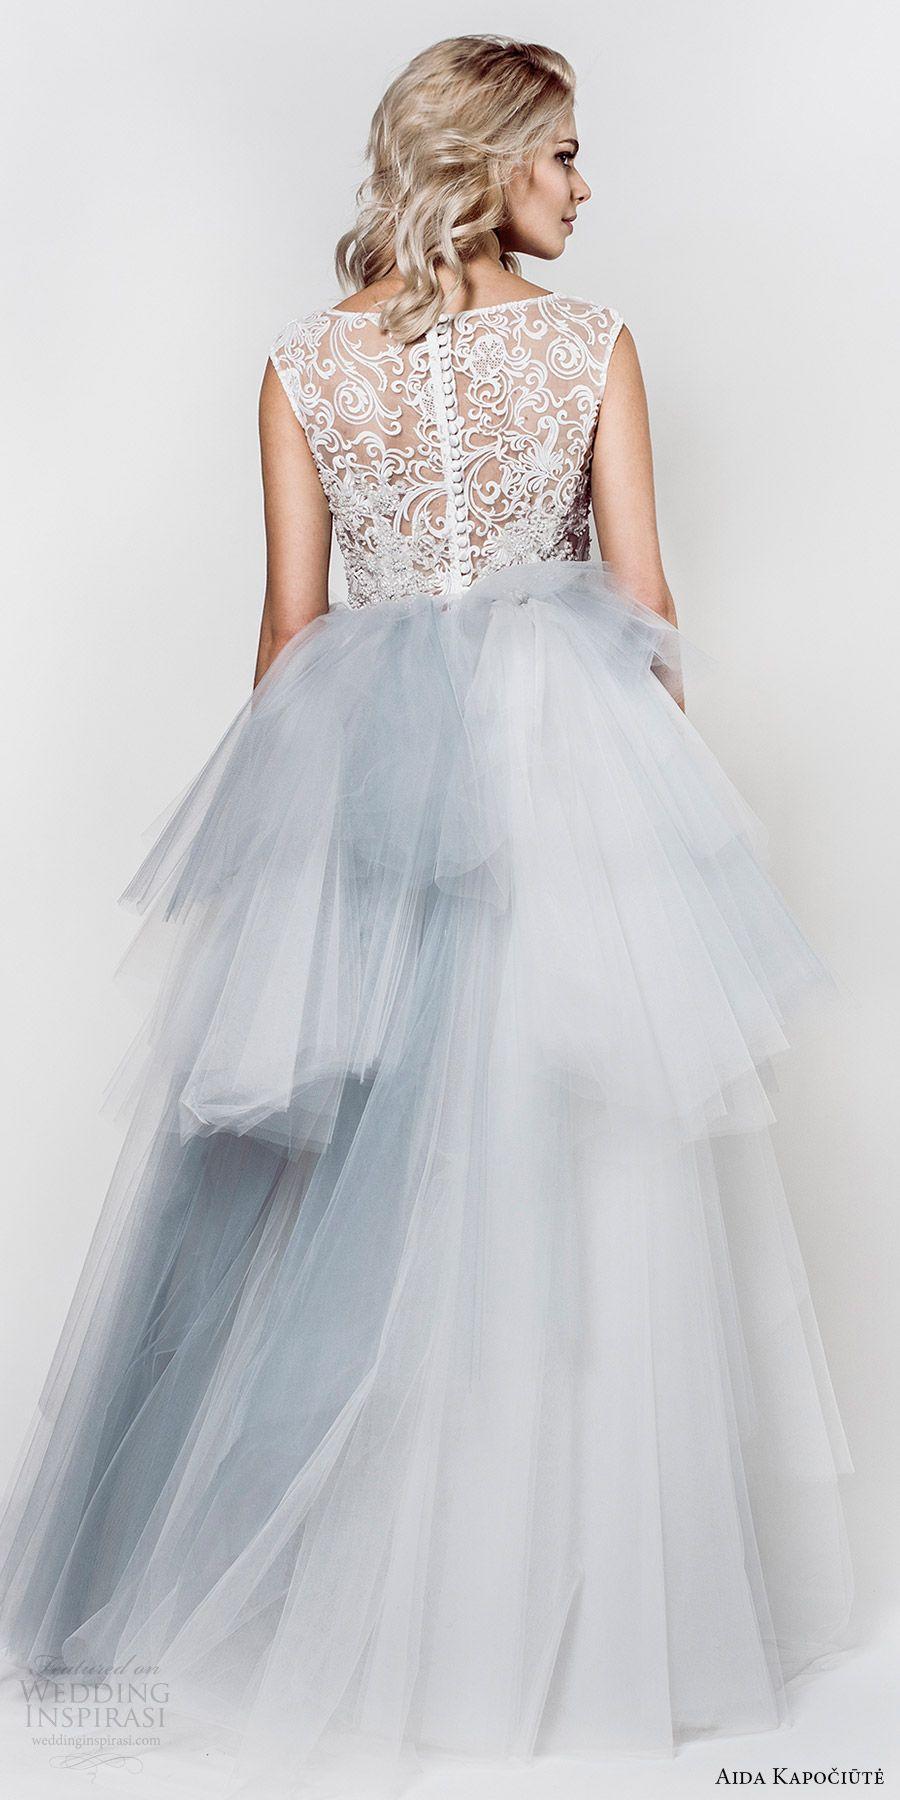 Aida kapociute wedding dresses pinterest light blue color